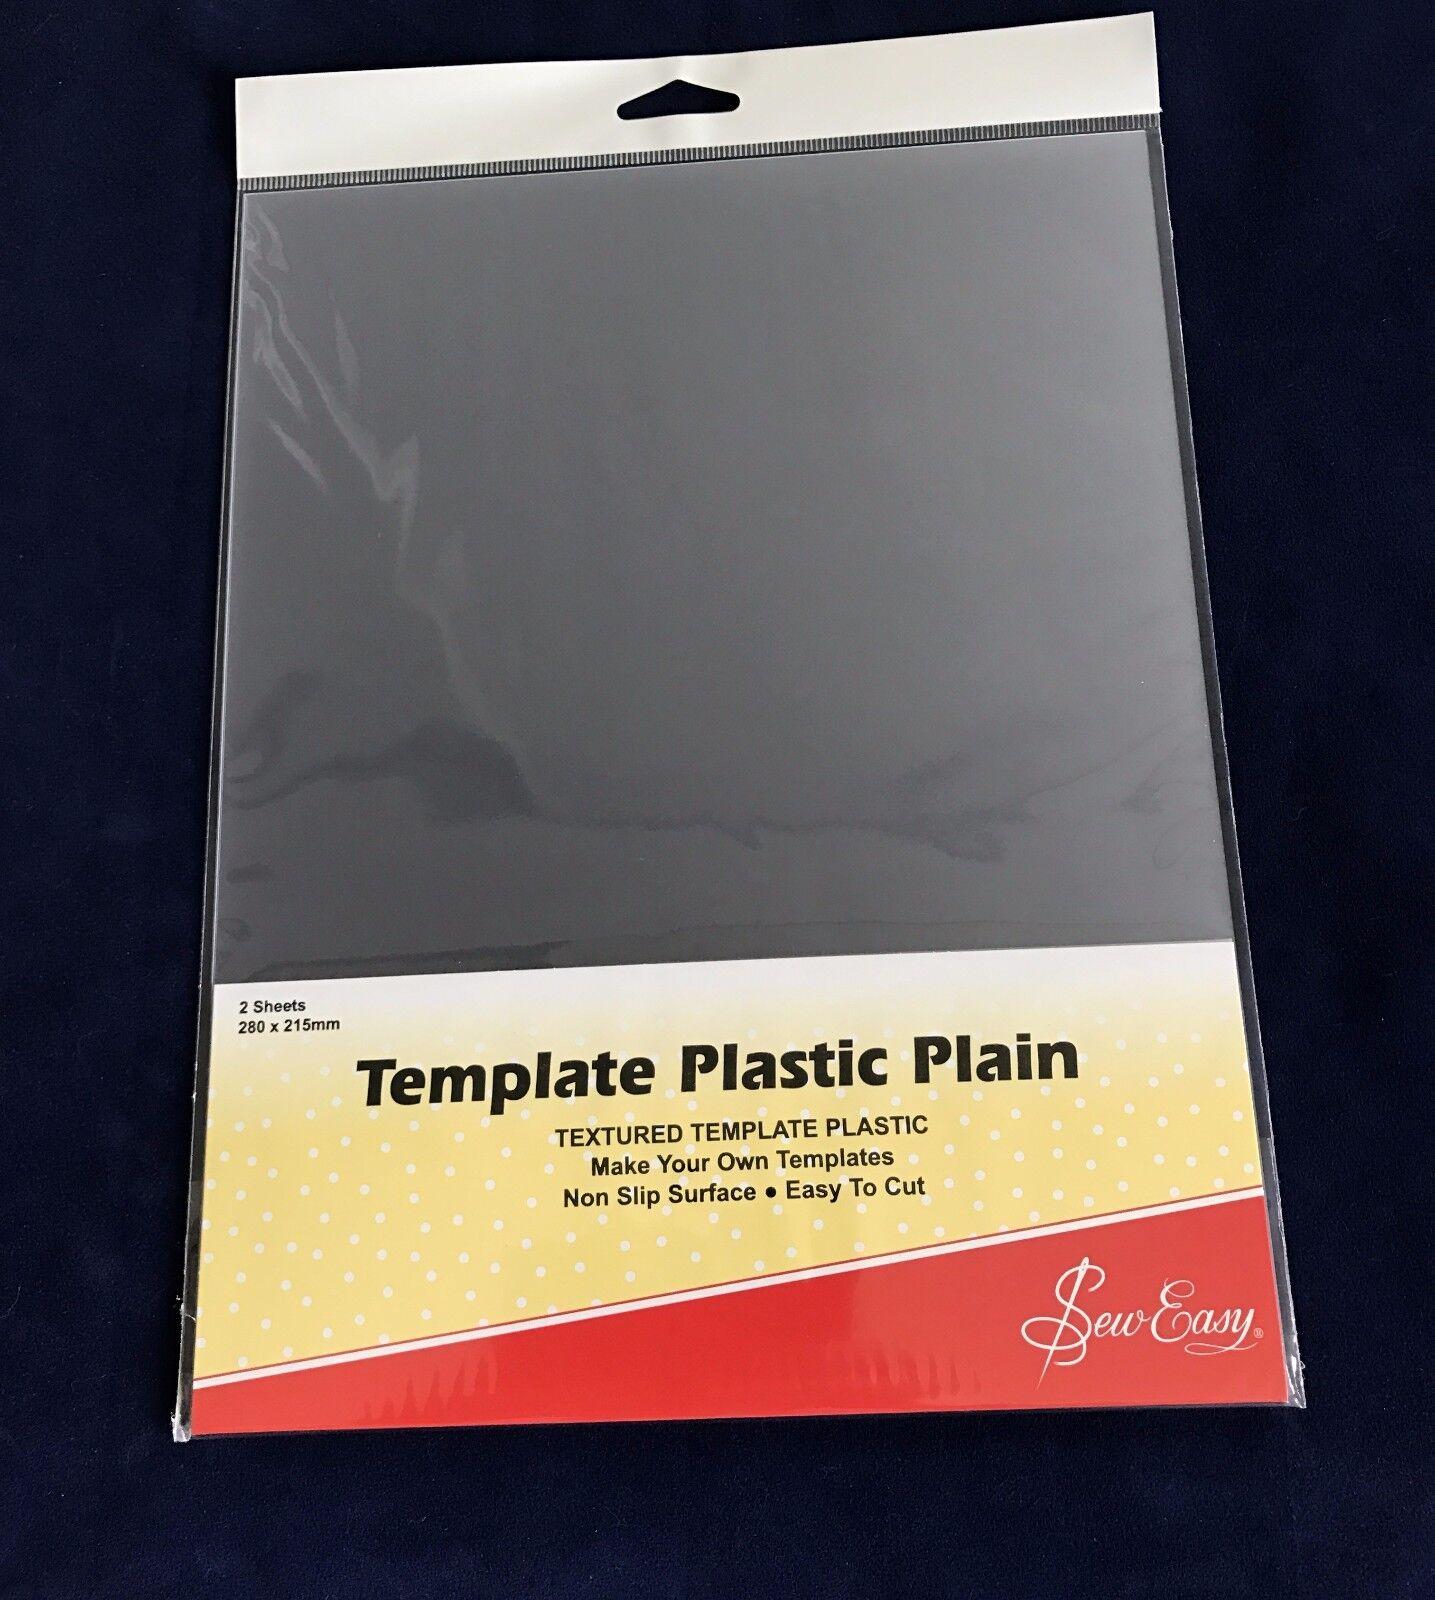 Sew Easy Template Plastic Plain Textured Non Slip Easy Cut - Make ...